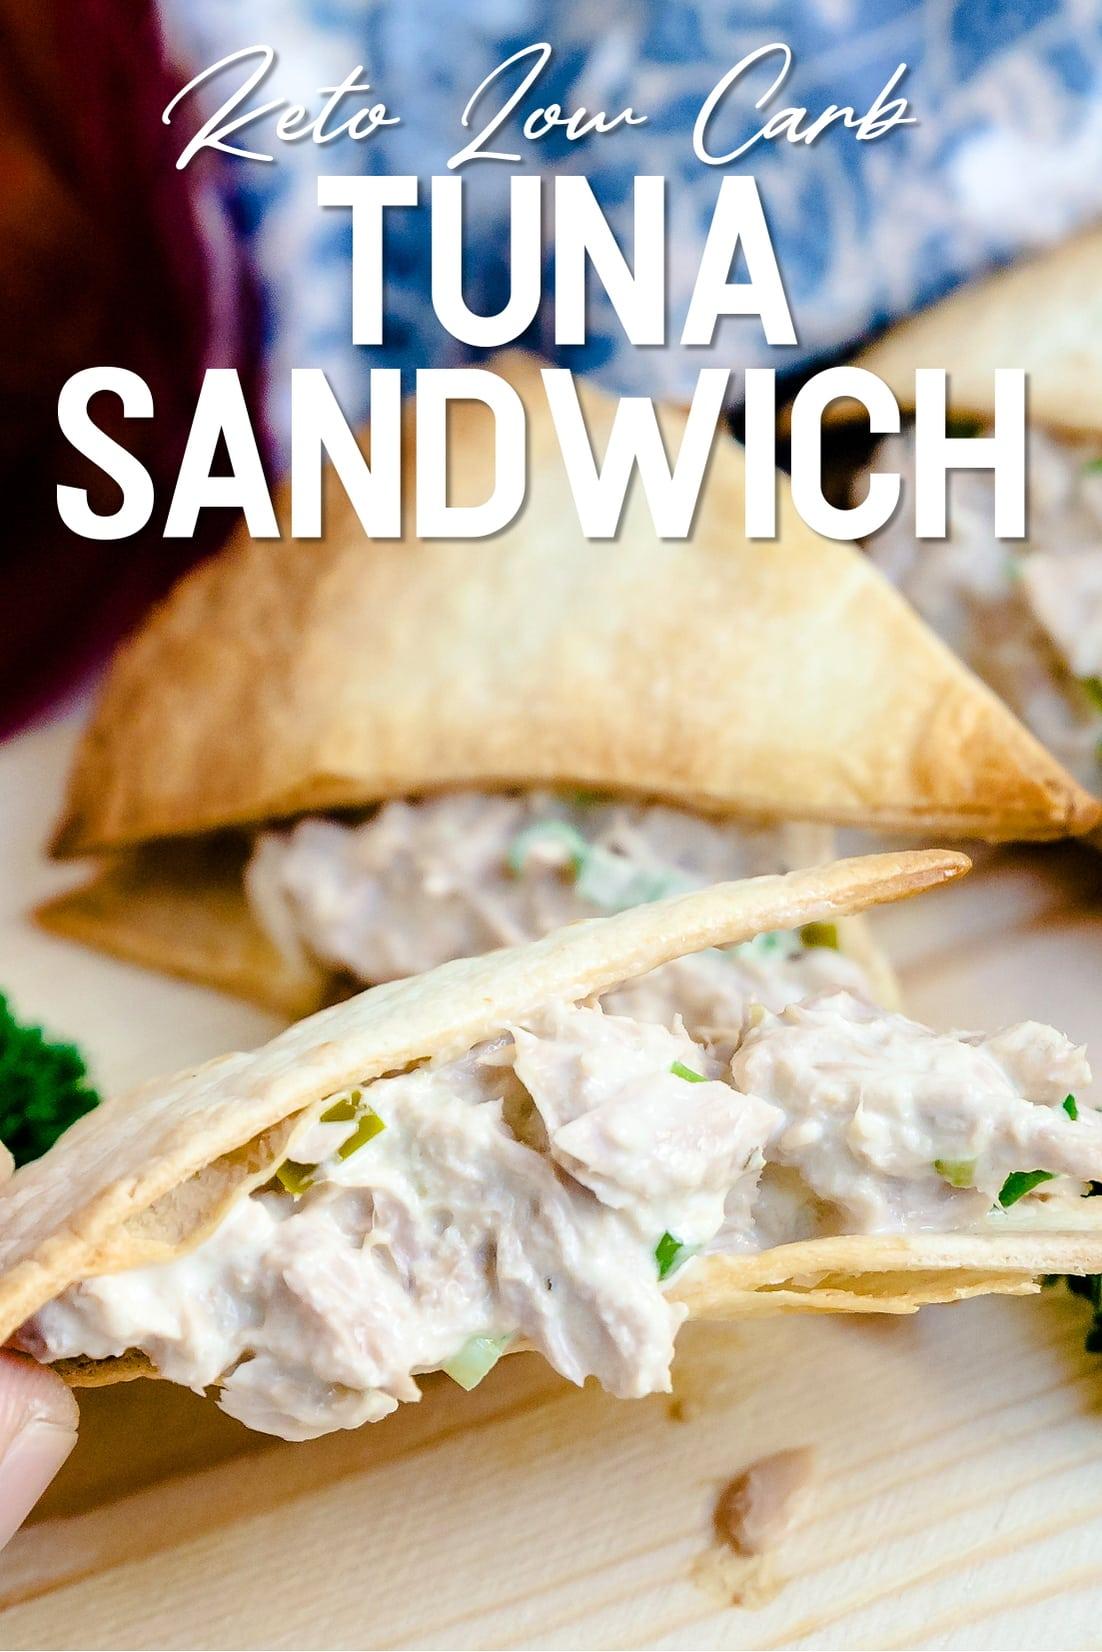 Keto Japanese Inspired Tuna Sandwich being held